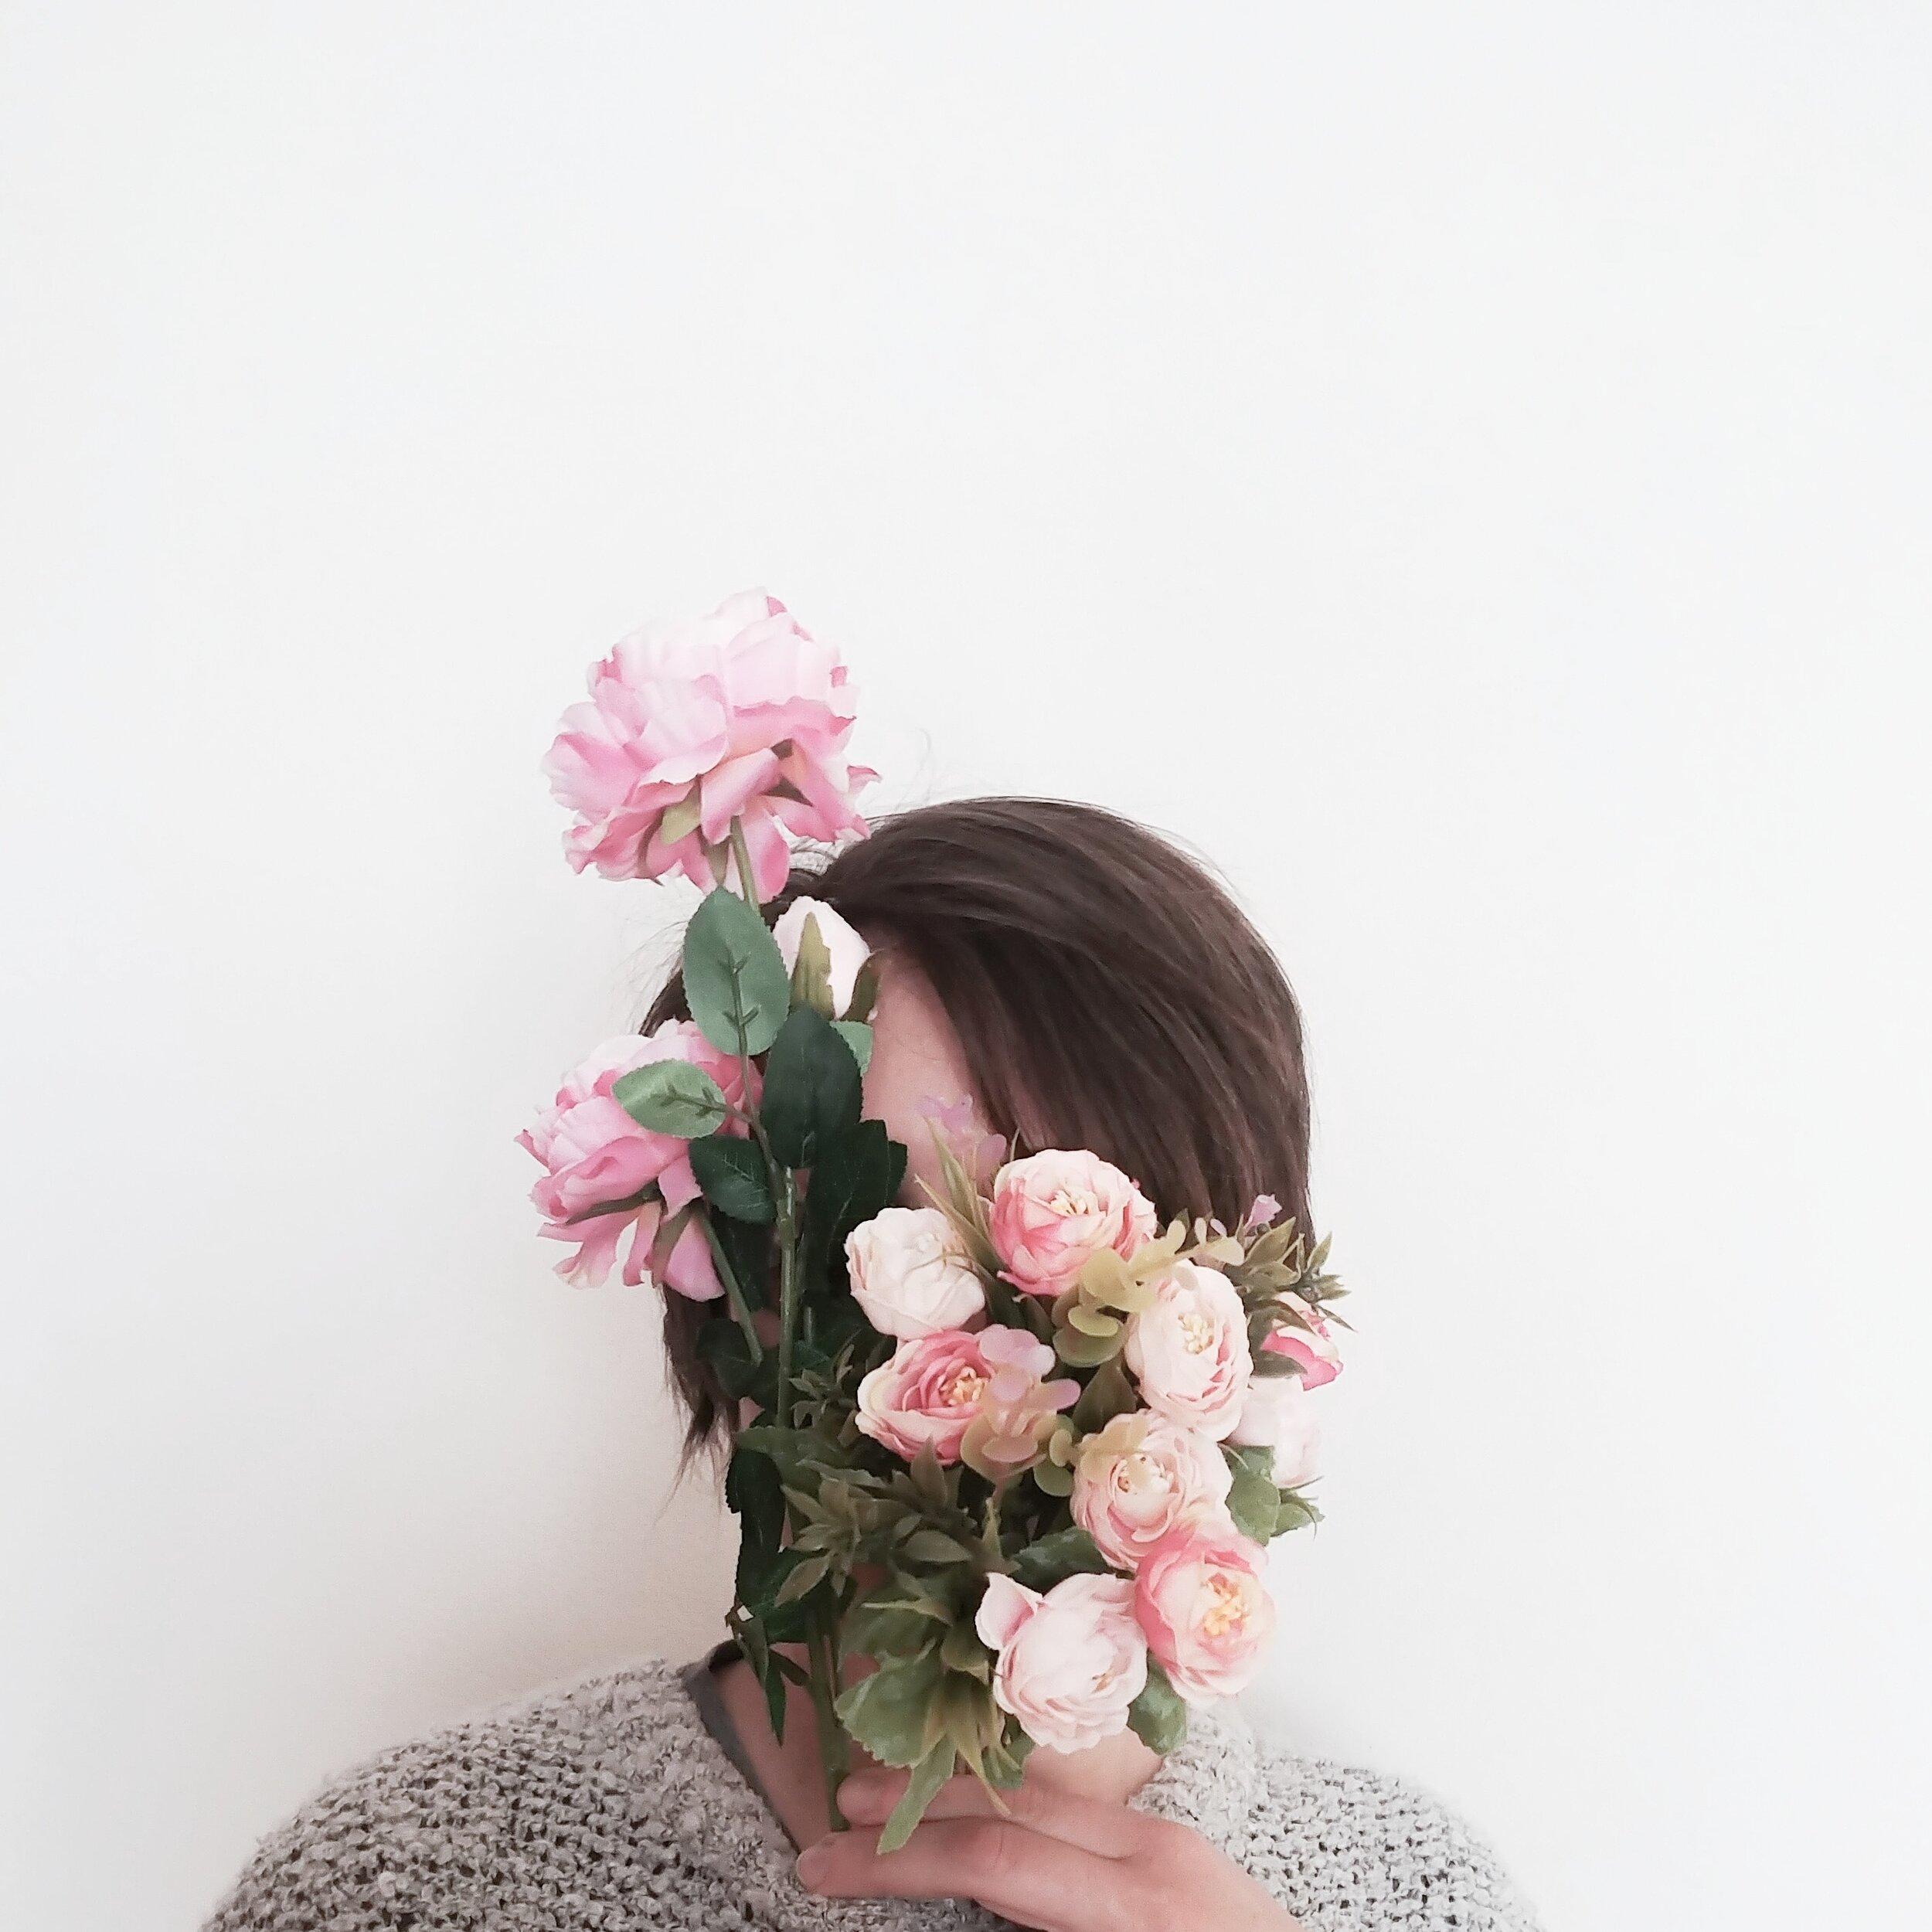 ARIA ANASTASIOU - IDEABAR STUDIO FOUNDER